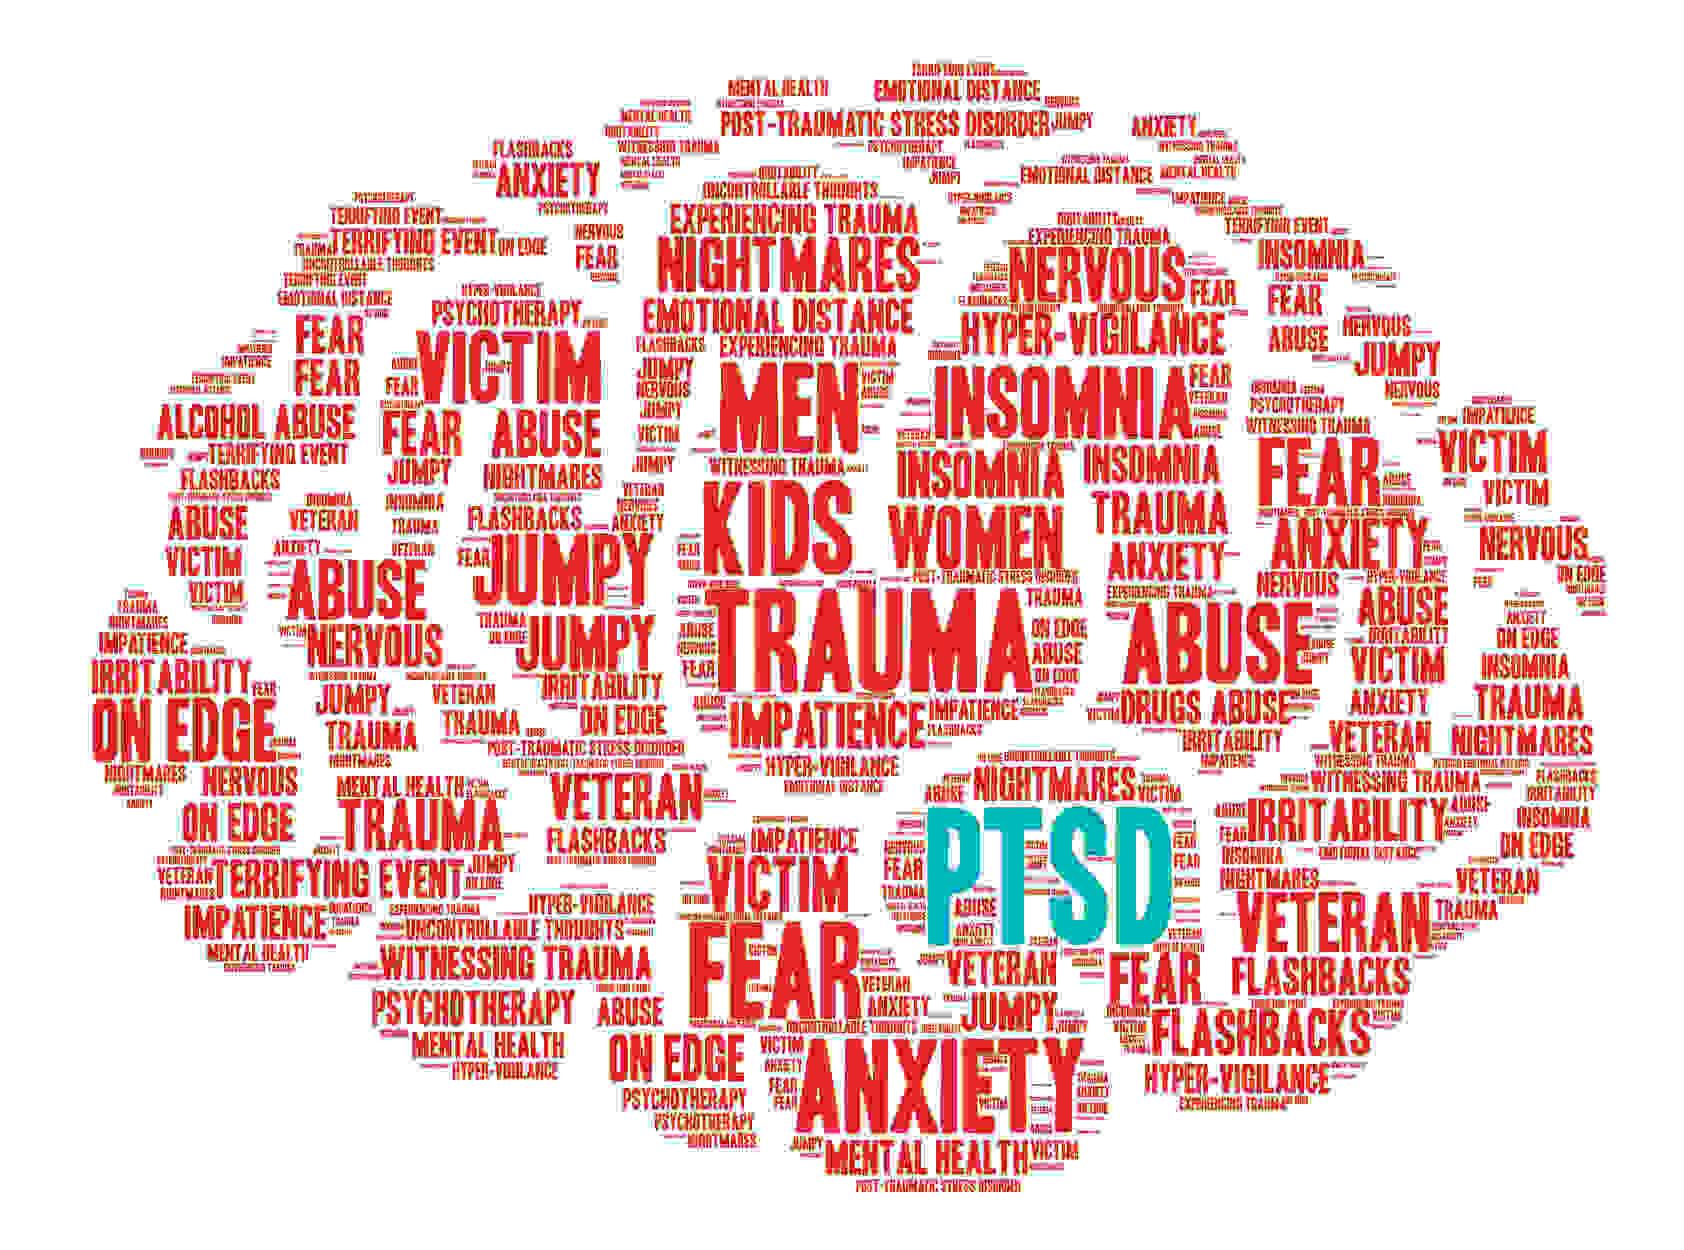 Post Traumatic Stress Disorder (PTSD) - Neuropsychiatry and